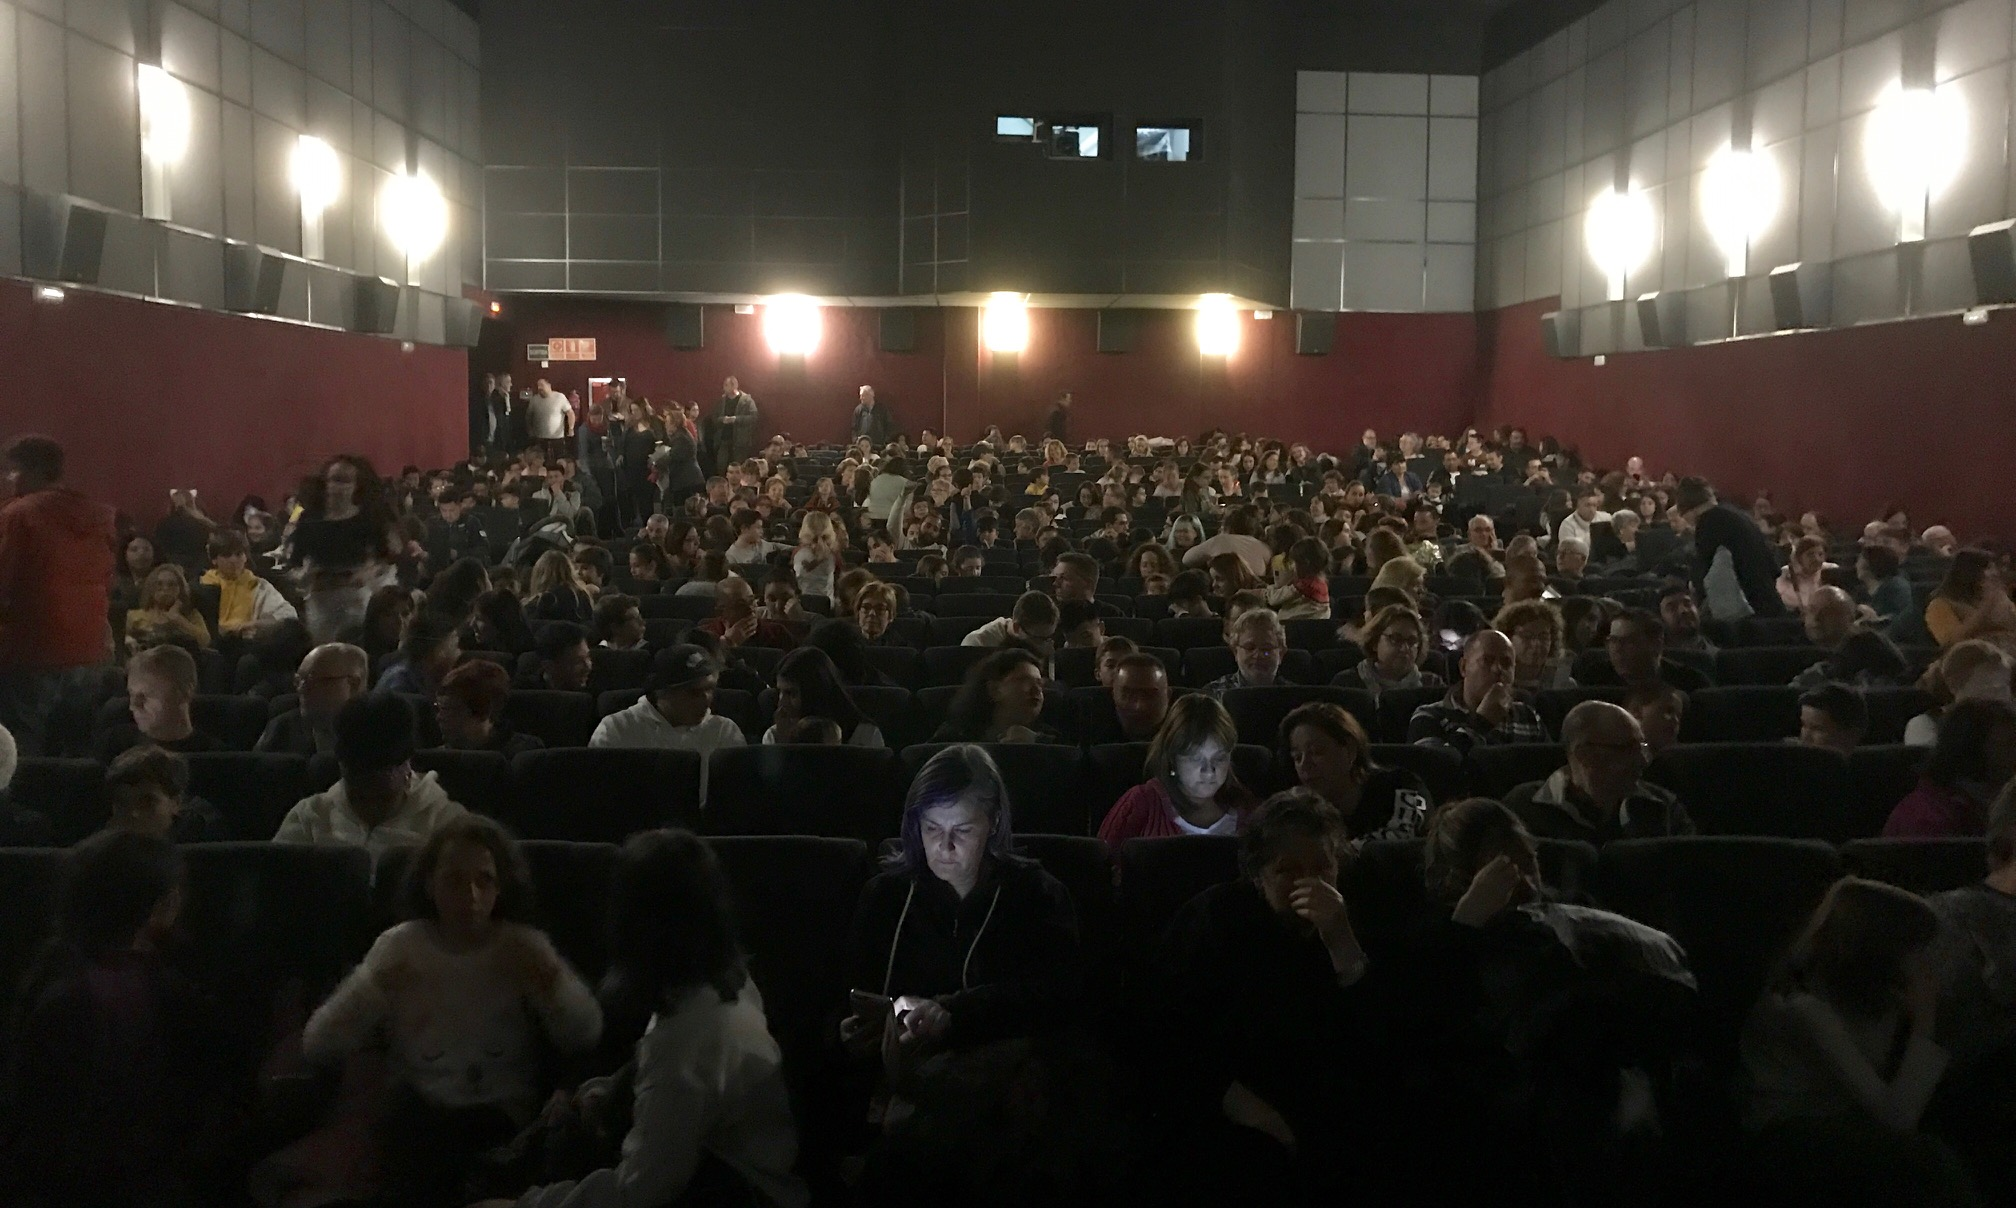 Cinema Arinco Palamós